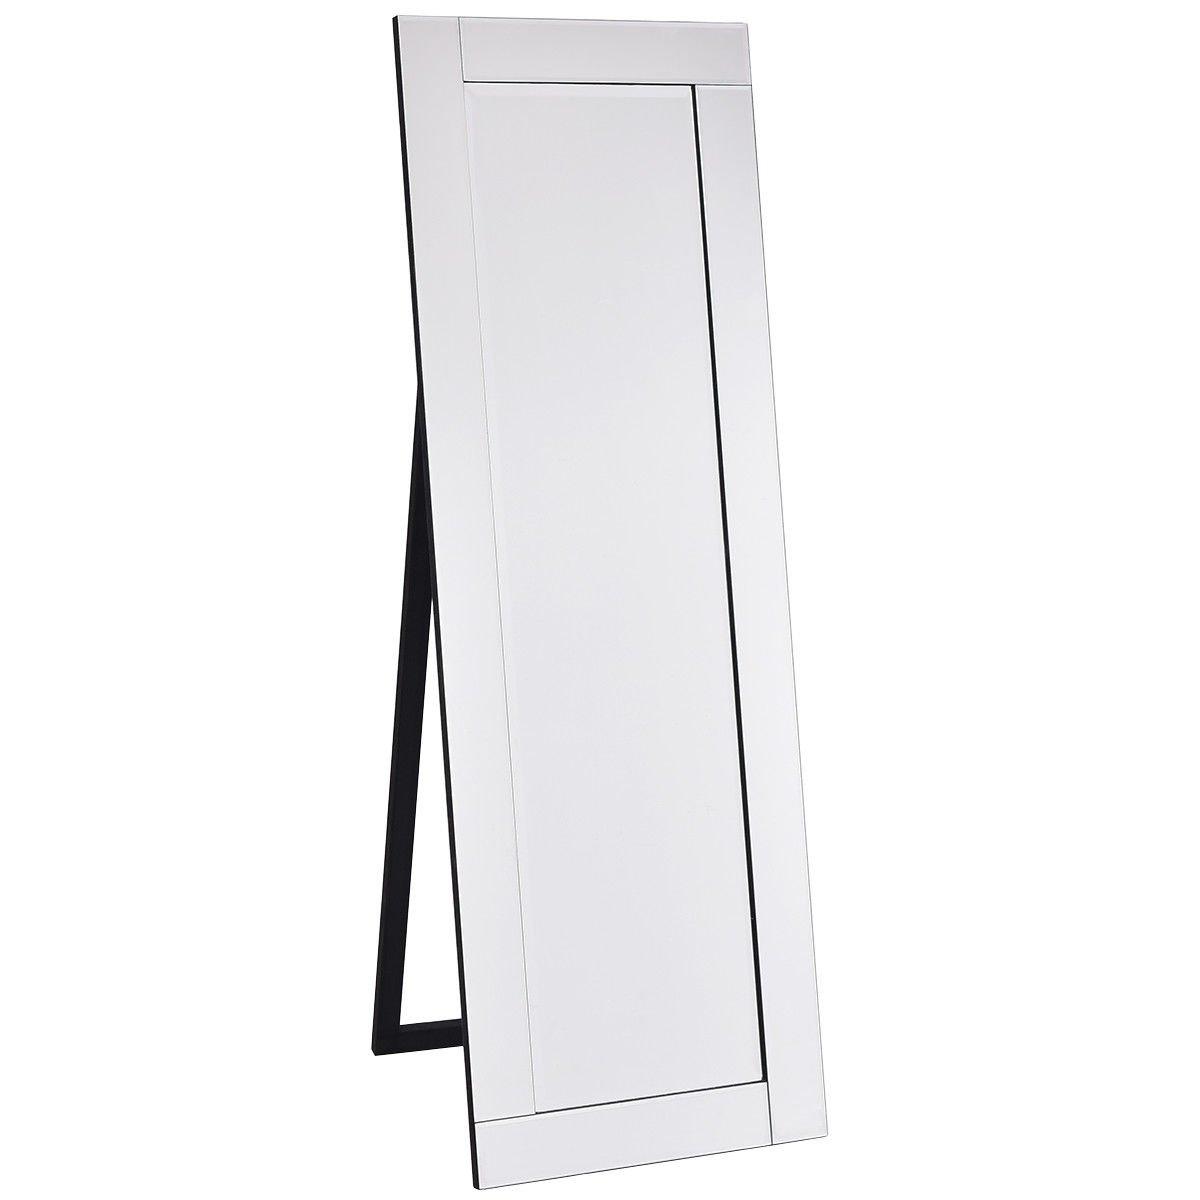 Cheap Full Length Standing Mirror Ikea Find Full Length Standing Mirror Ikea Deals On Line At Alibaba Com